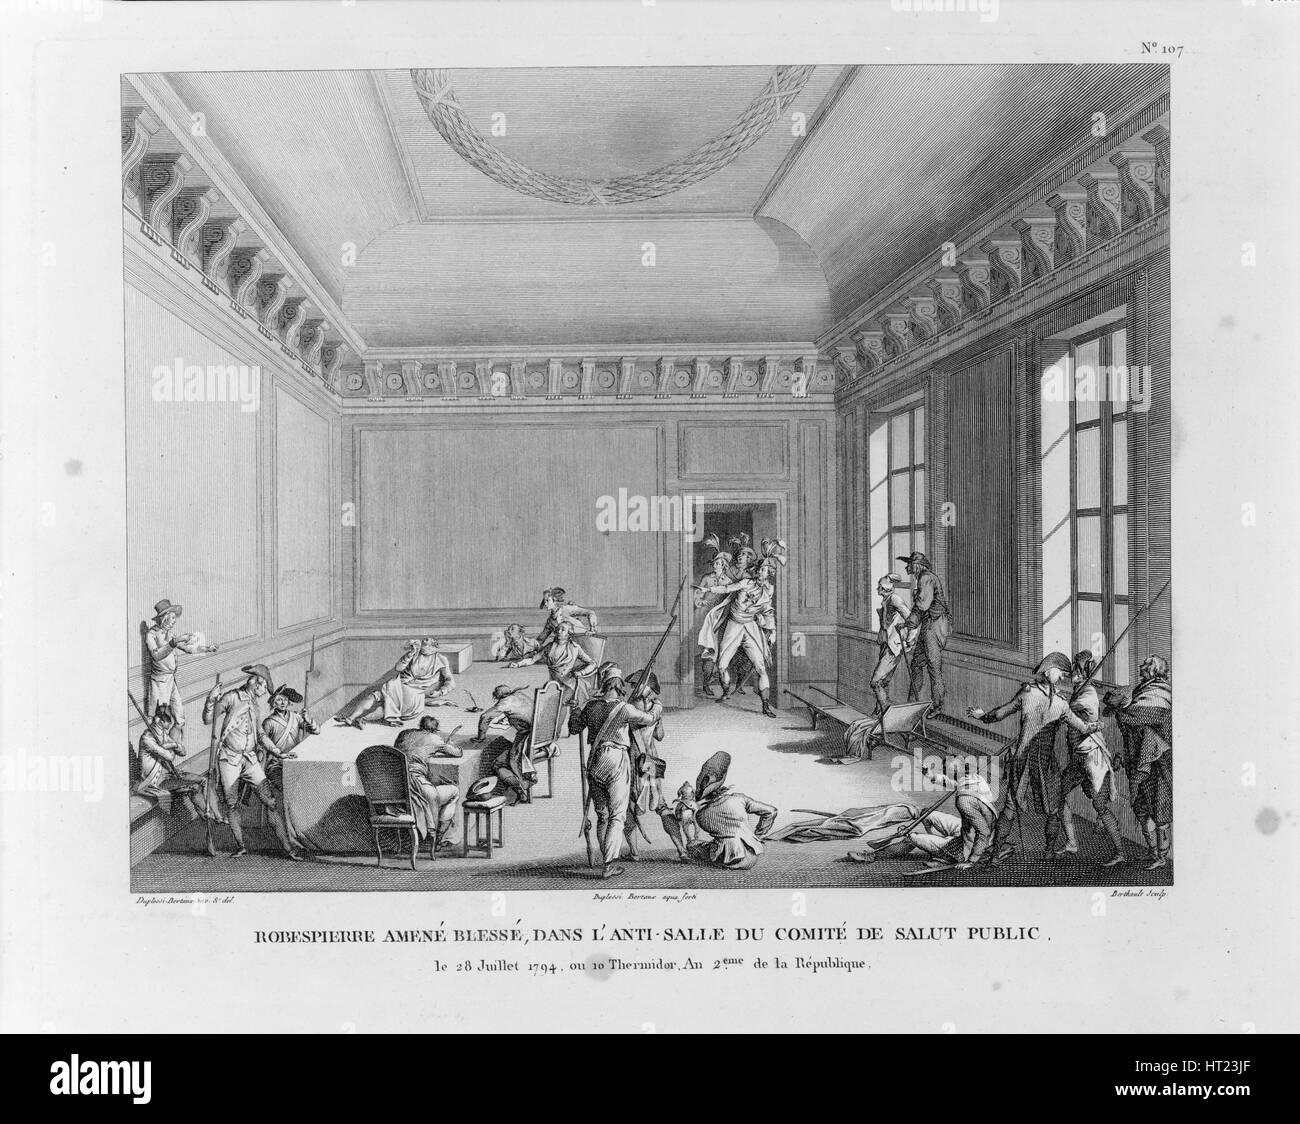 The Arrest of Robespierre on 27 July 1794, 1794. Artist: Berthault, Pierre Gabriel (1748-1819) - Stock Image